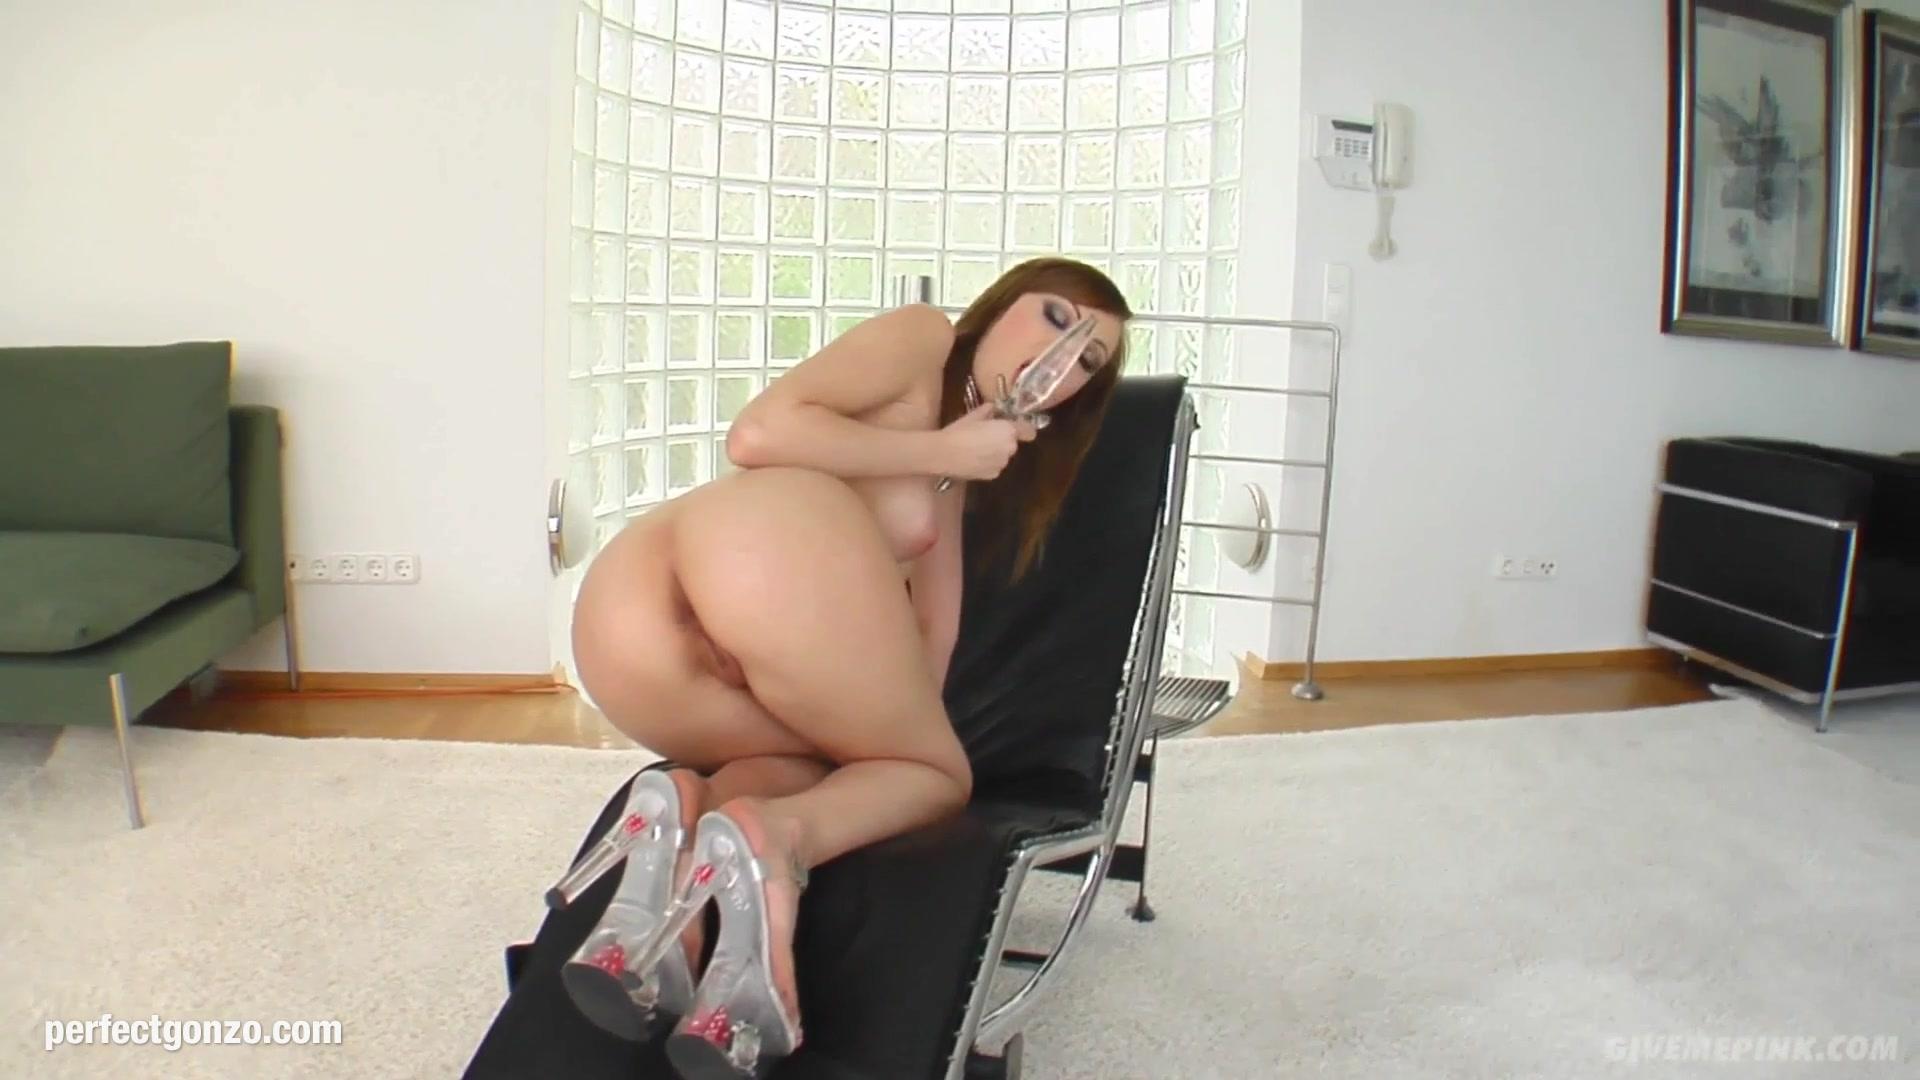 Home cock bondage Adult Videos